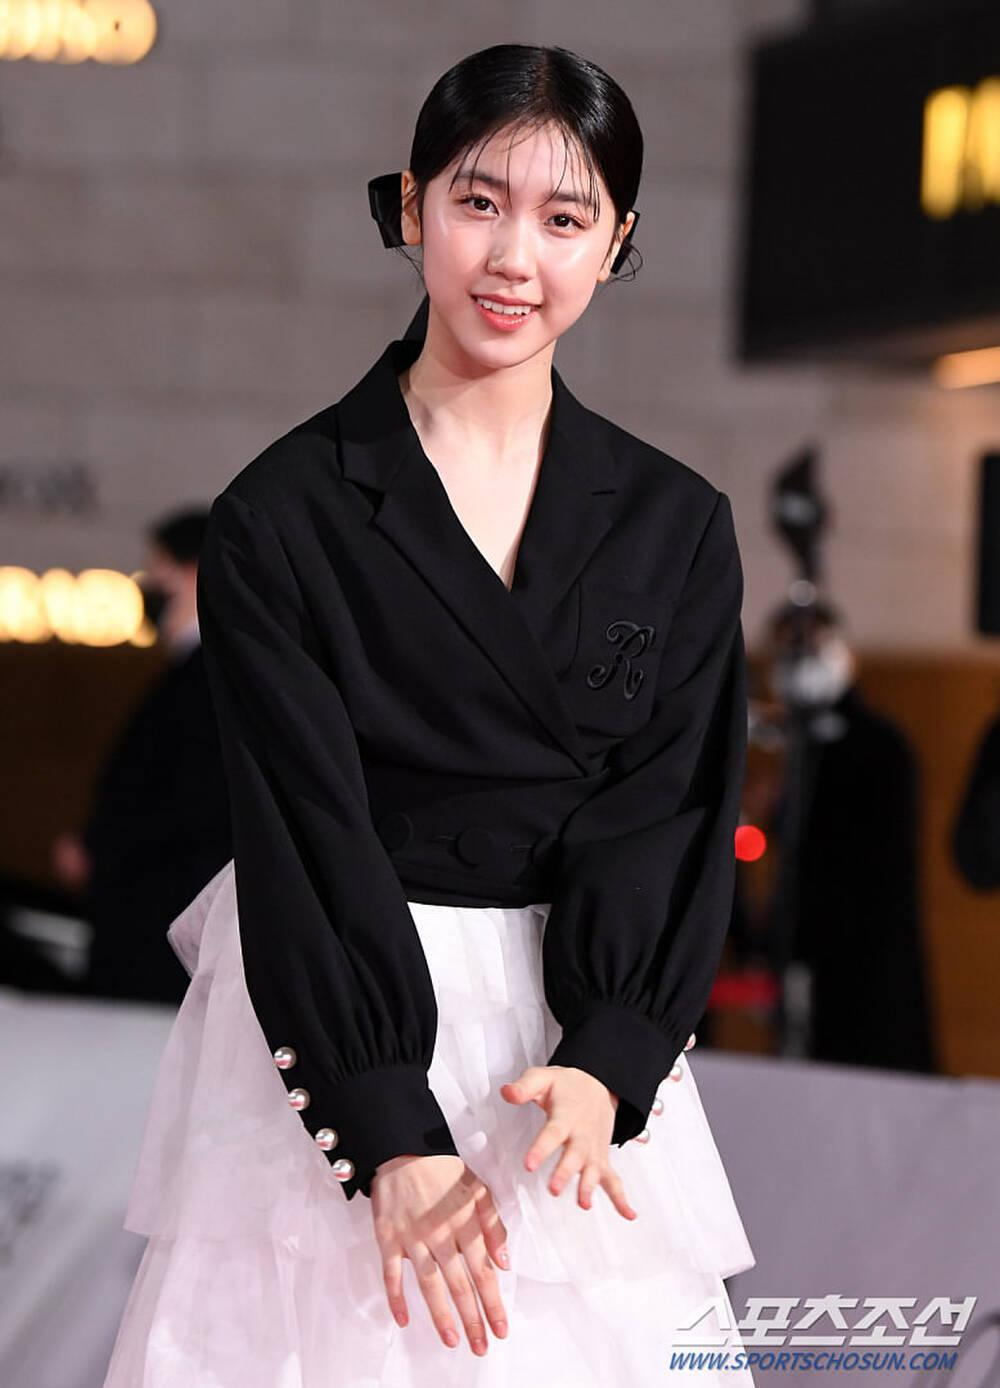 Thảm đỏ 'Rồng xanh 2020': Shin Hye Sun 'cân sắc' Shin Min Ah, Jung Woo Sung - Lee Byung Hun điển trai! Ảnh 7